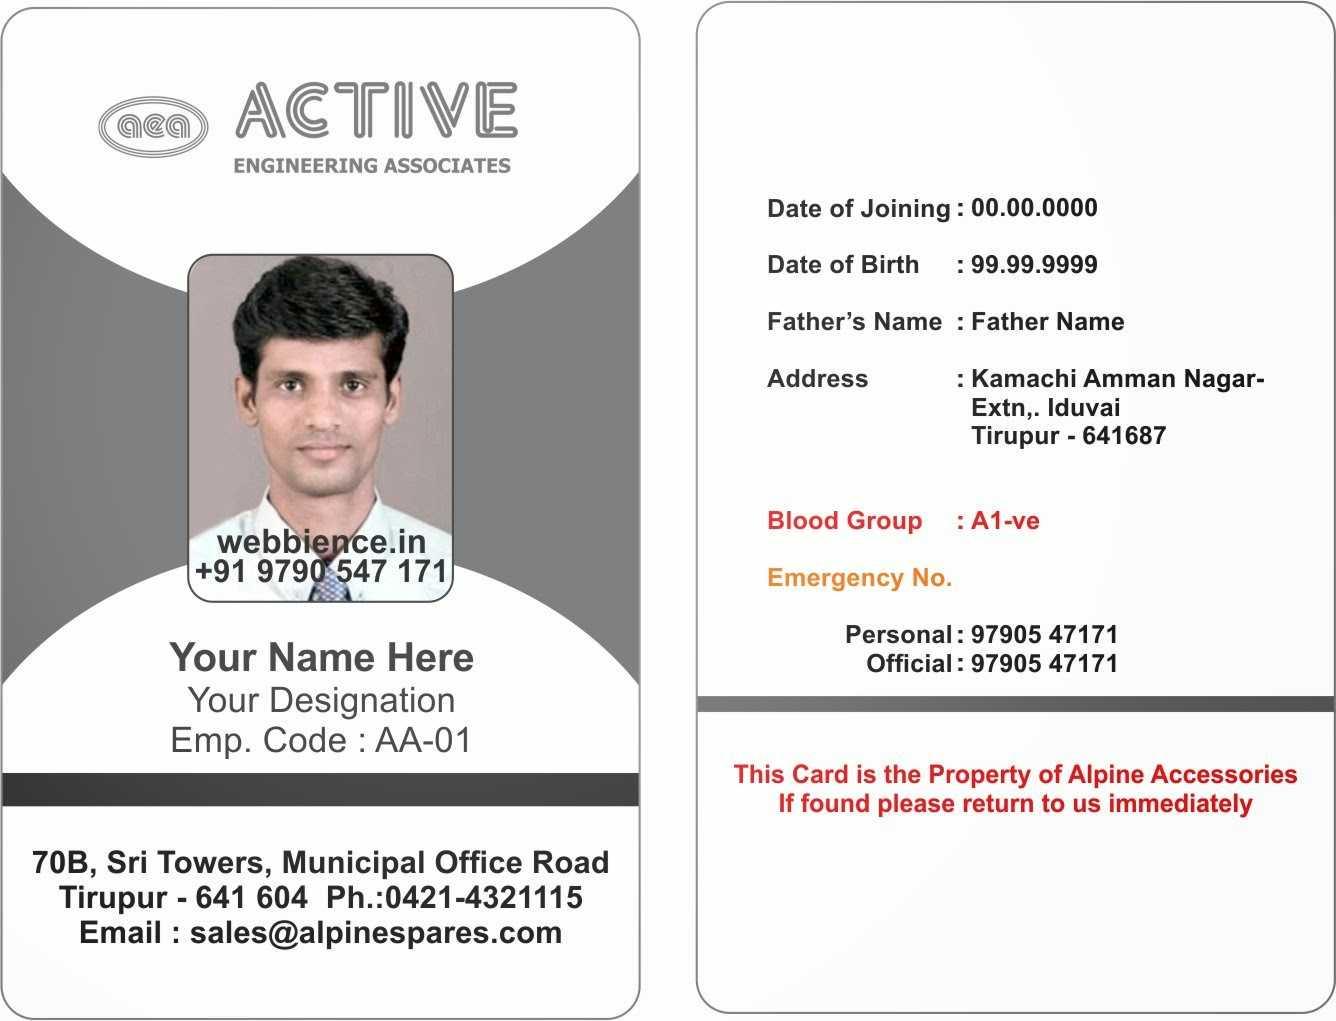 022 Employee Id Card Template Microsoft Word Free Download Regarding Employee Card Template Word